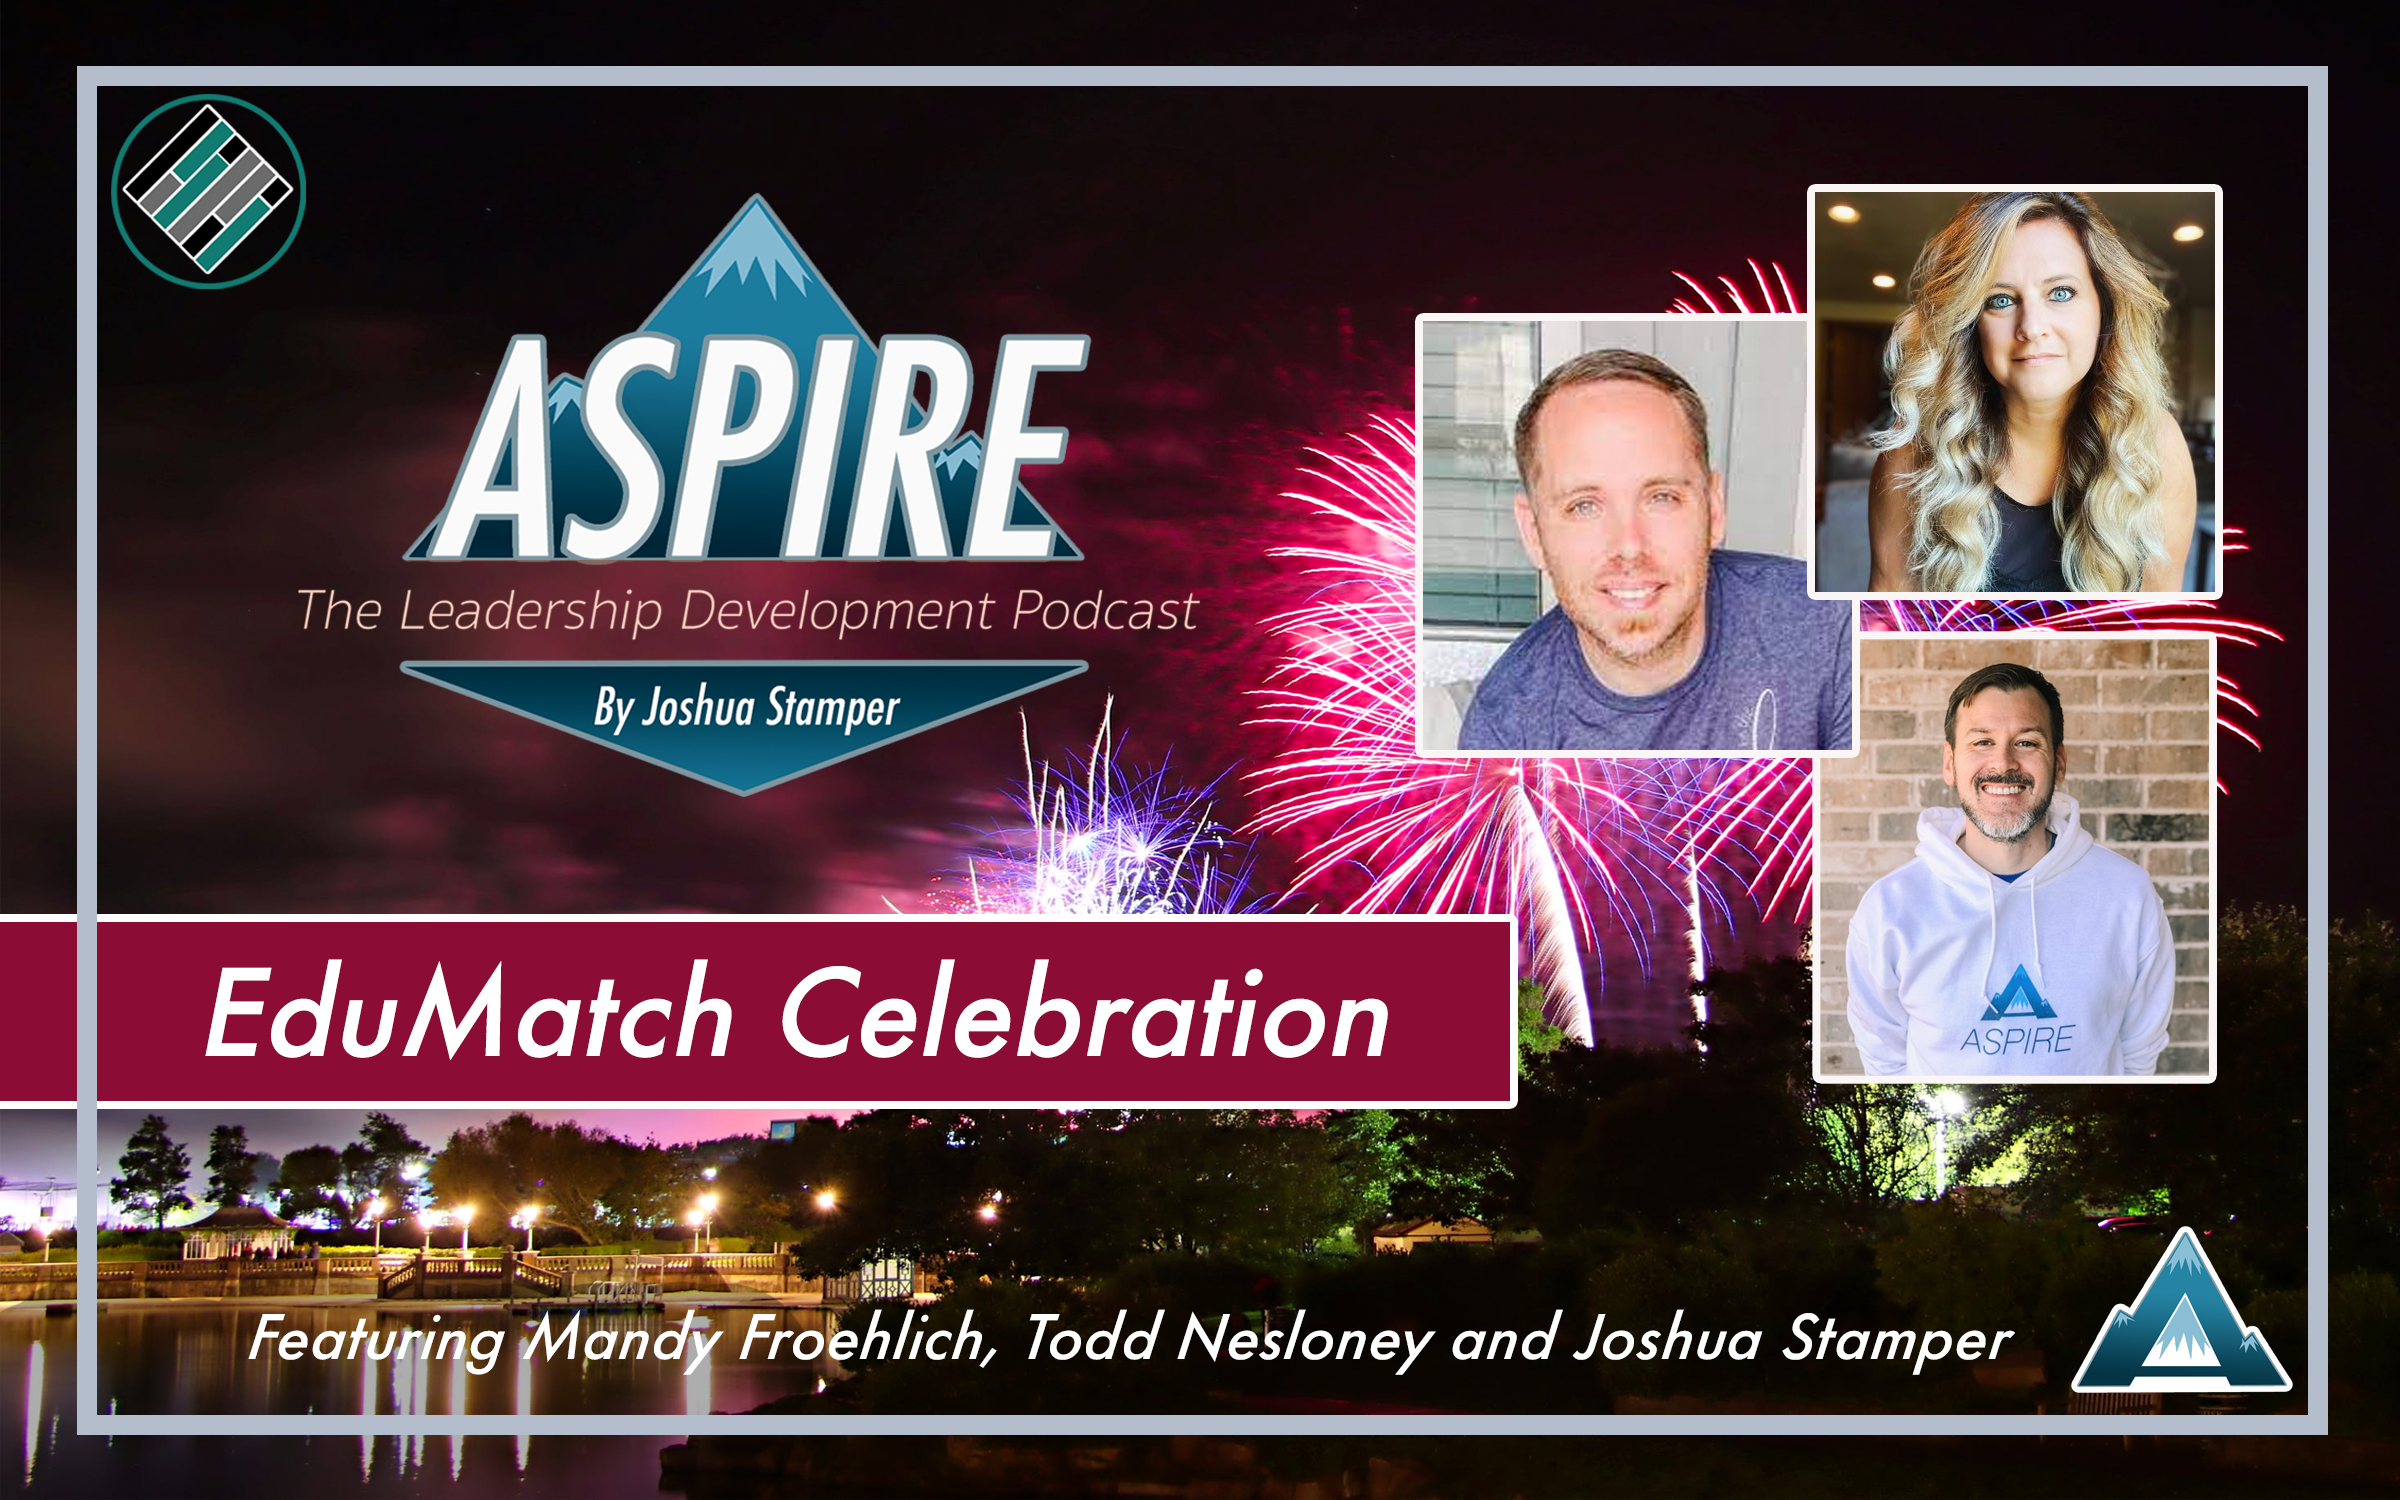 Joshua Stamper, Aspire to Lead, EduMatch, Aspire: The Leadership Development Podcast, Teach Better, #AspireLead